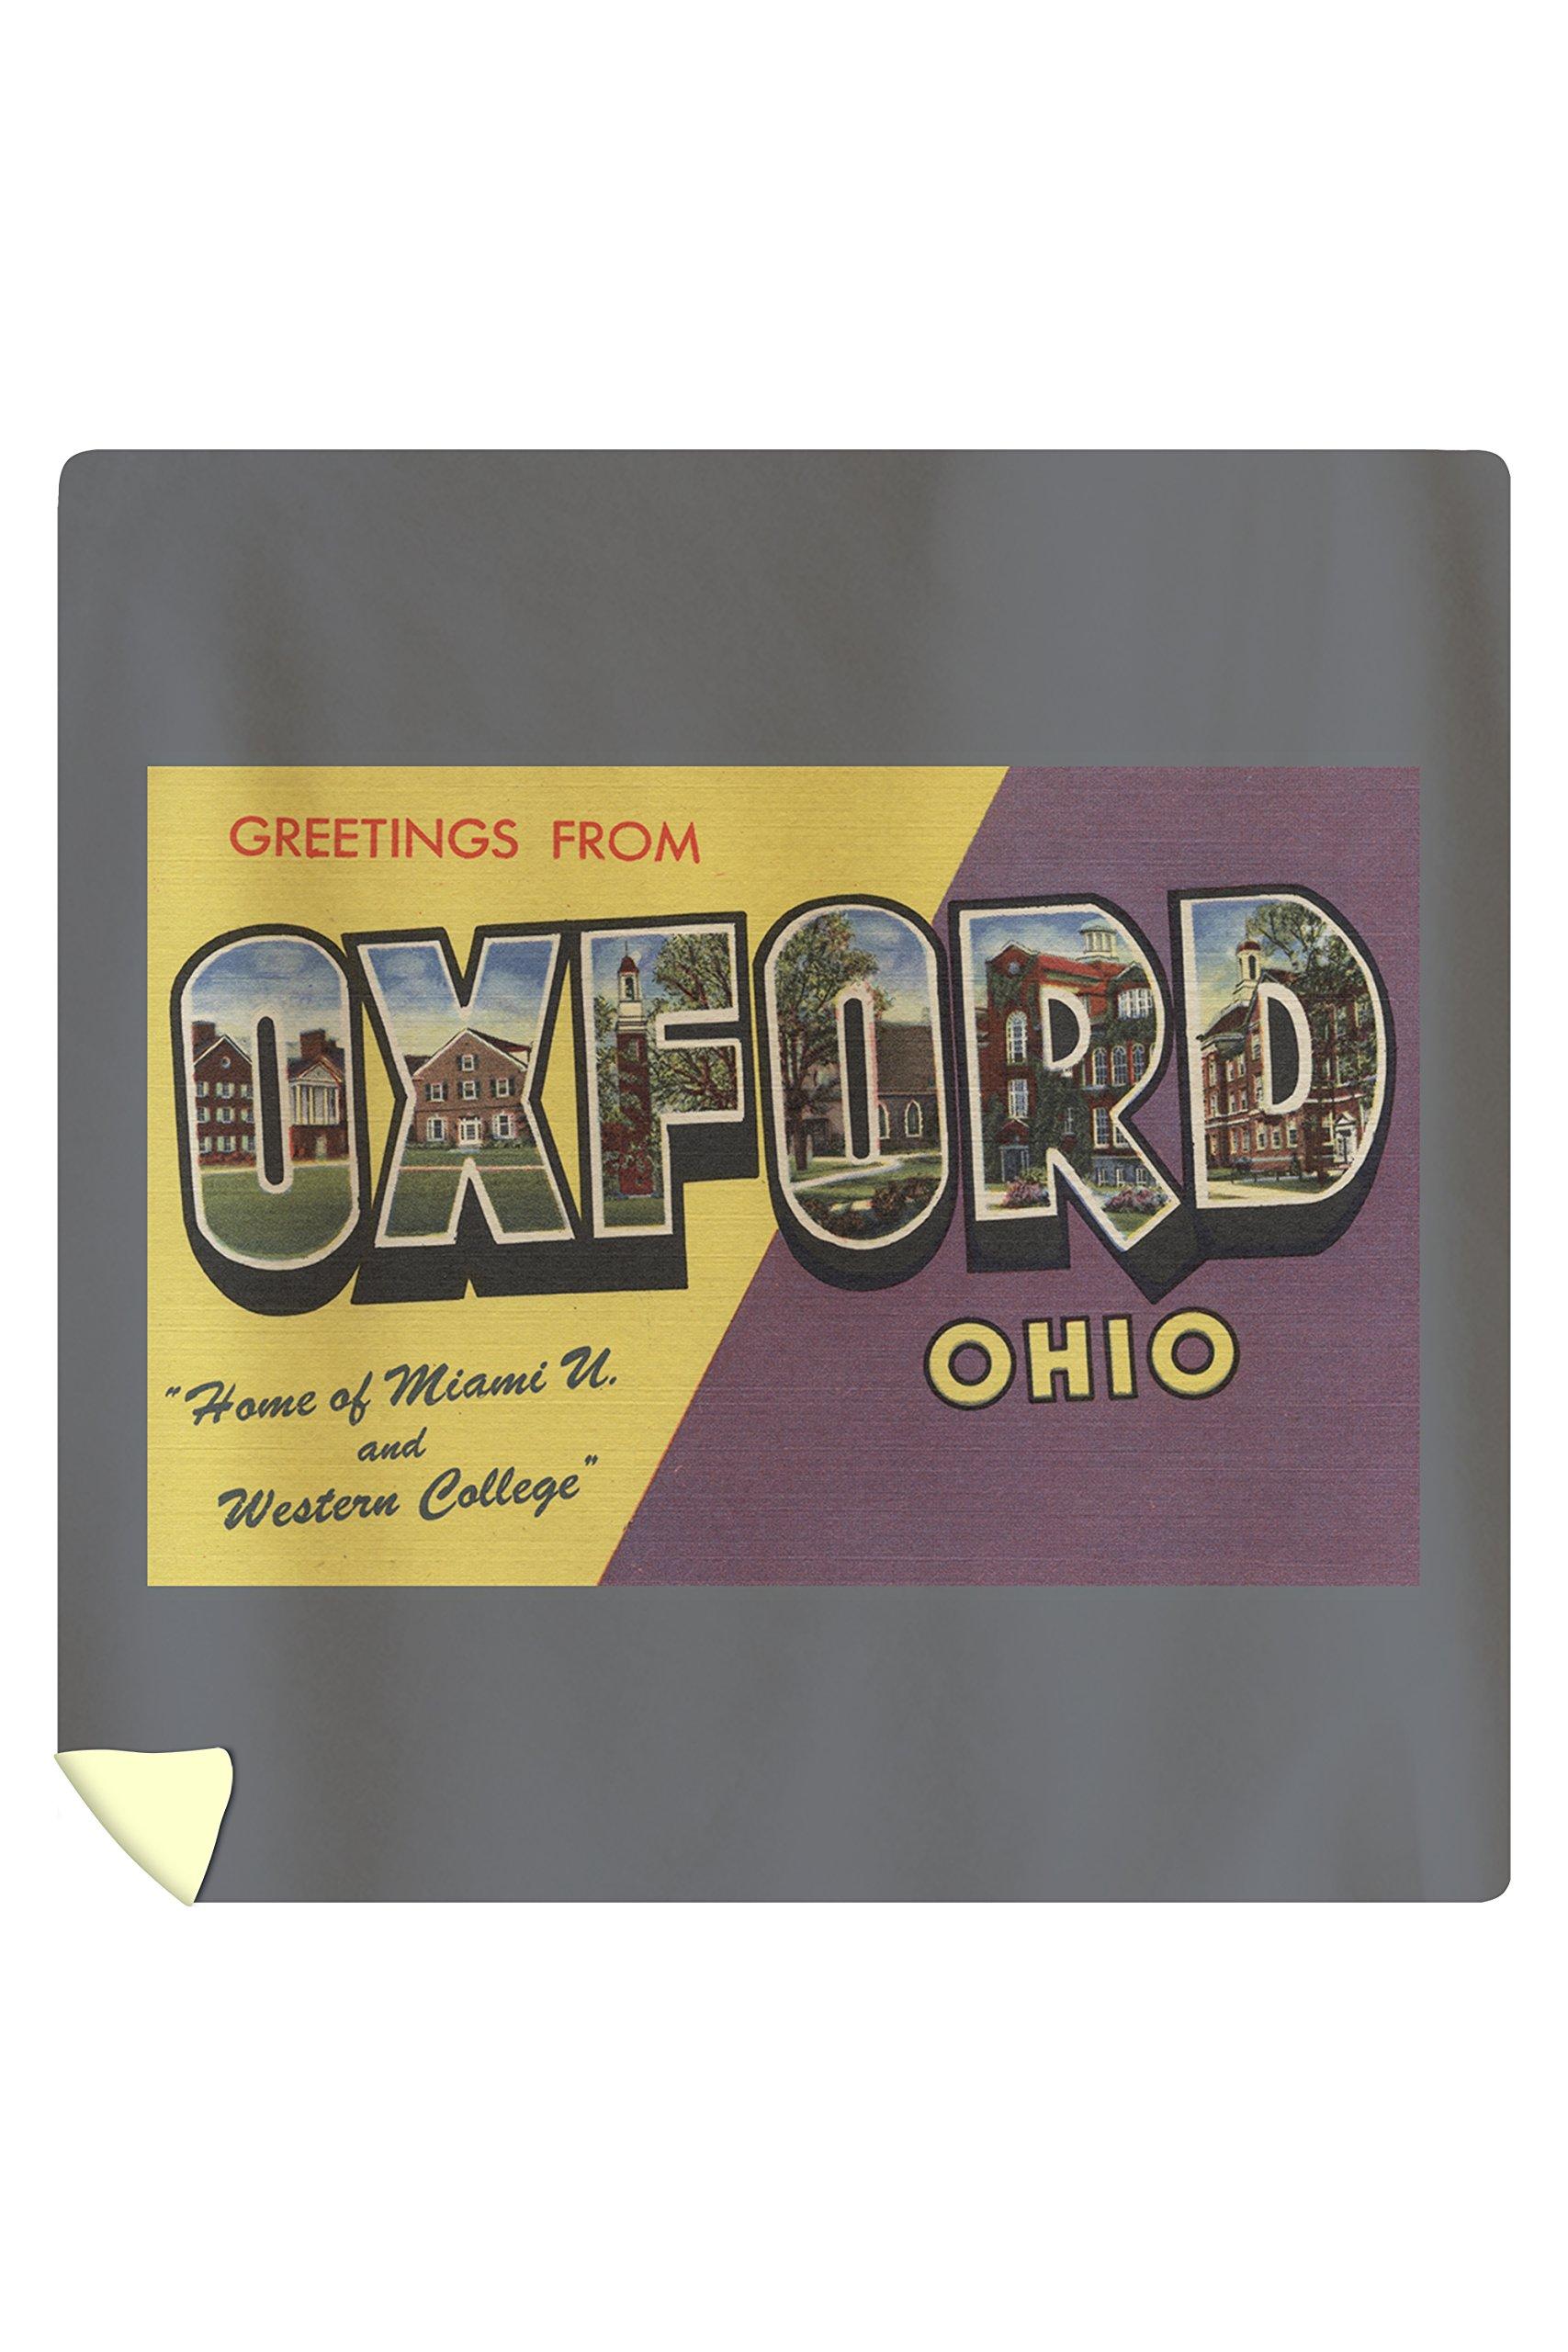 Oxford, Ohio - Miami U and Western College - Vintage Halftone (88x88 Queen Microfiber Duvet Cover)